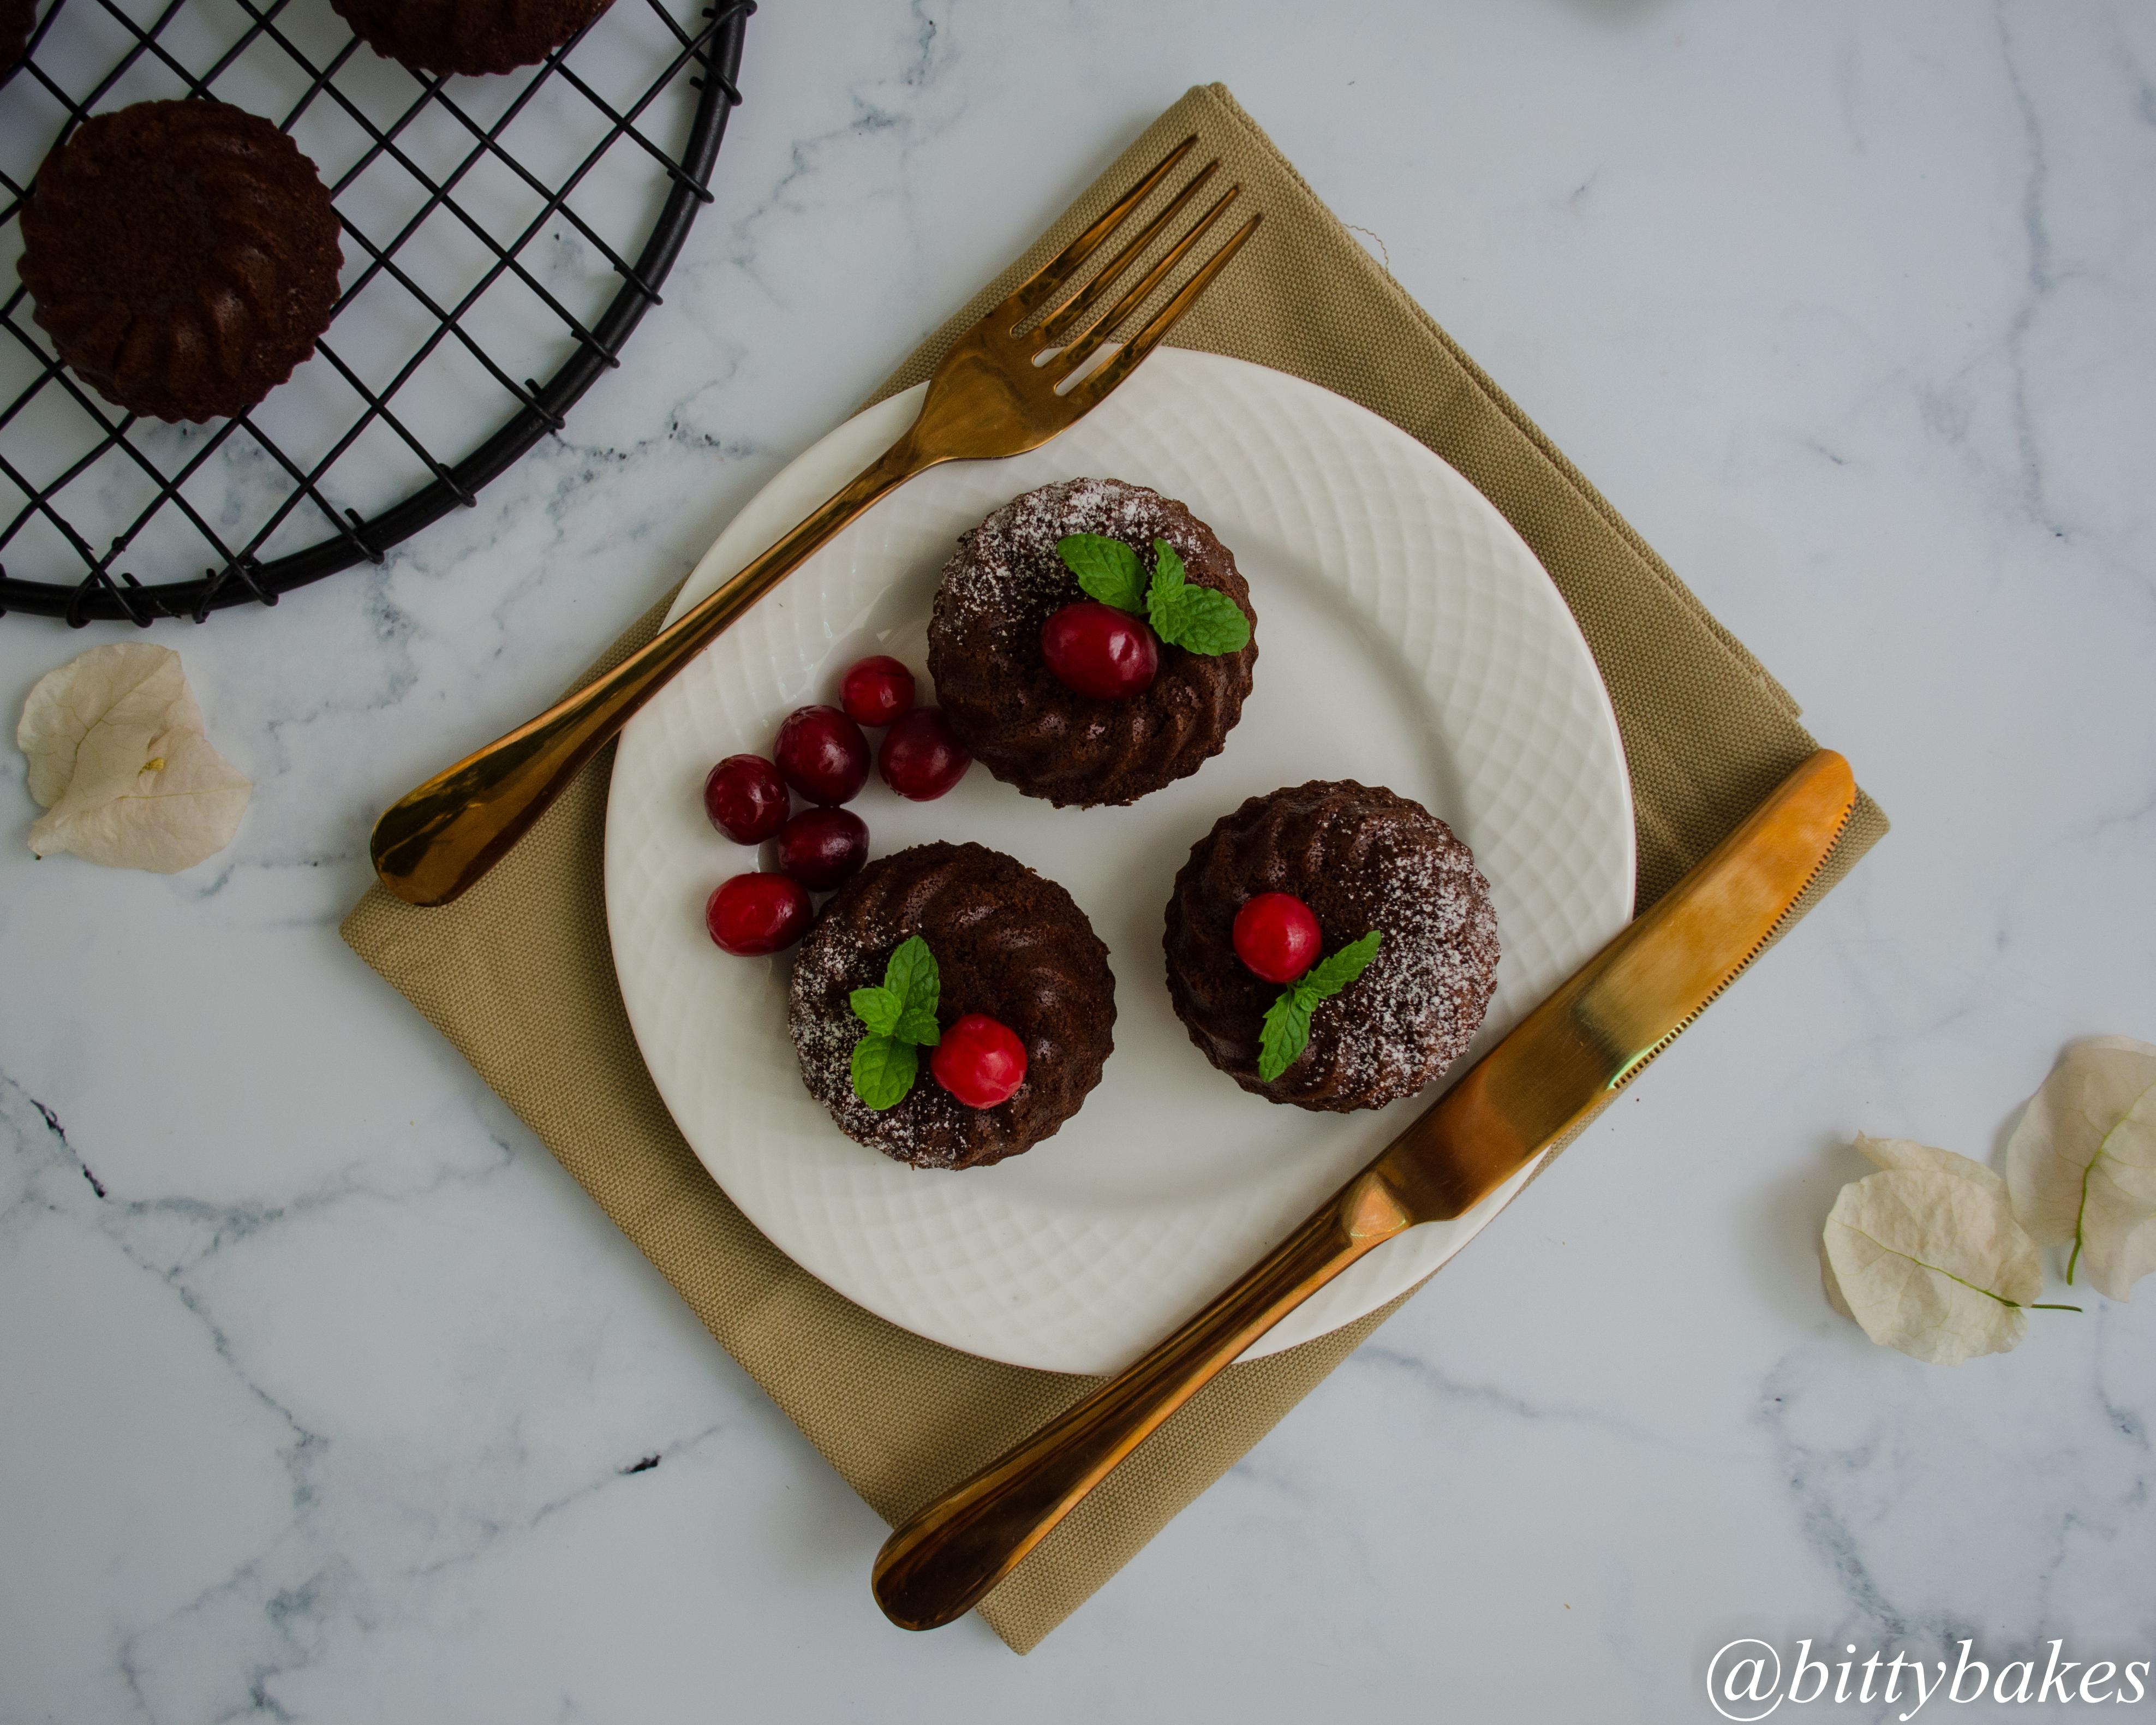 how to make Chocolate mud cake